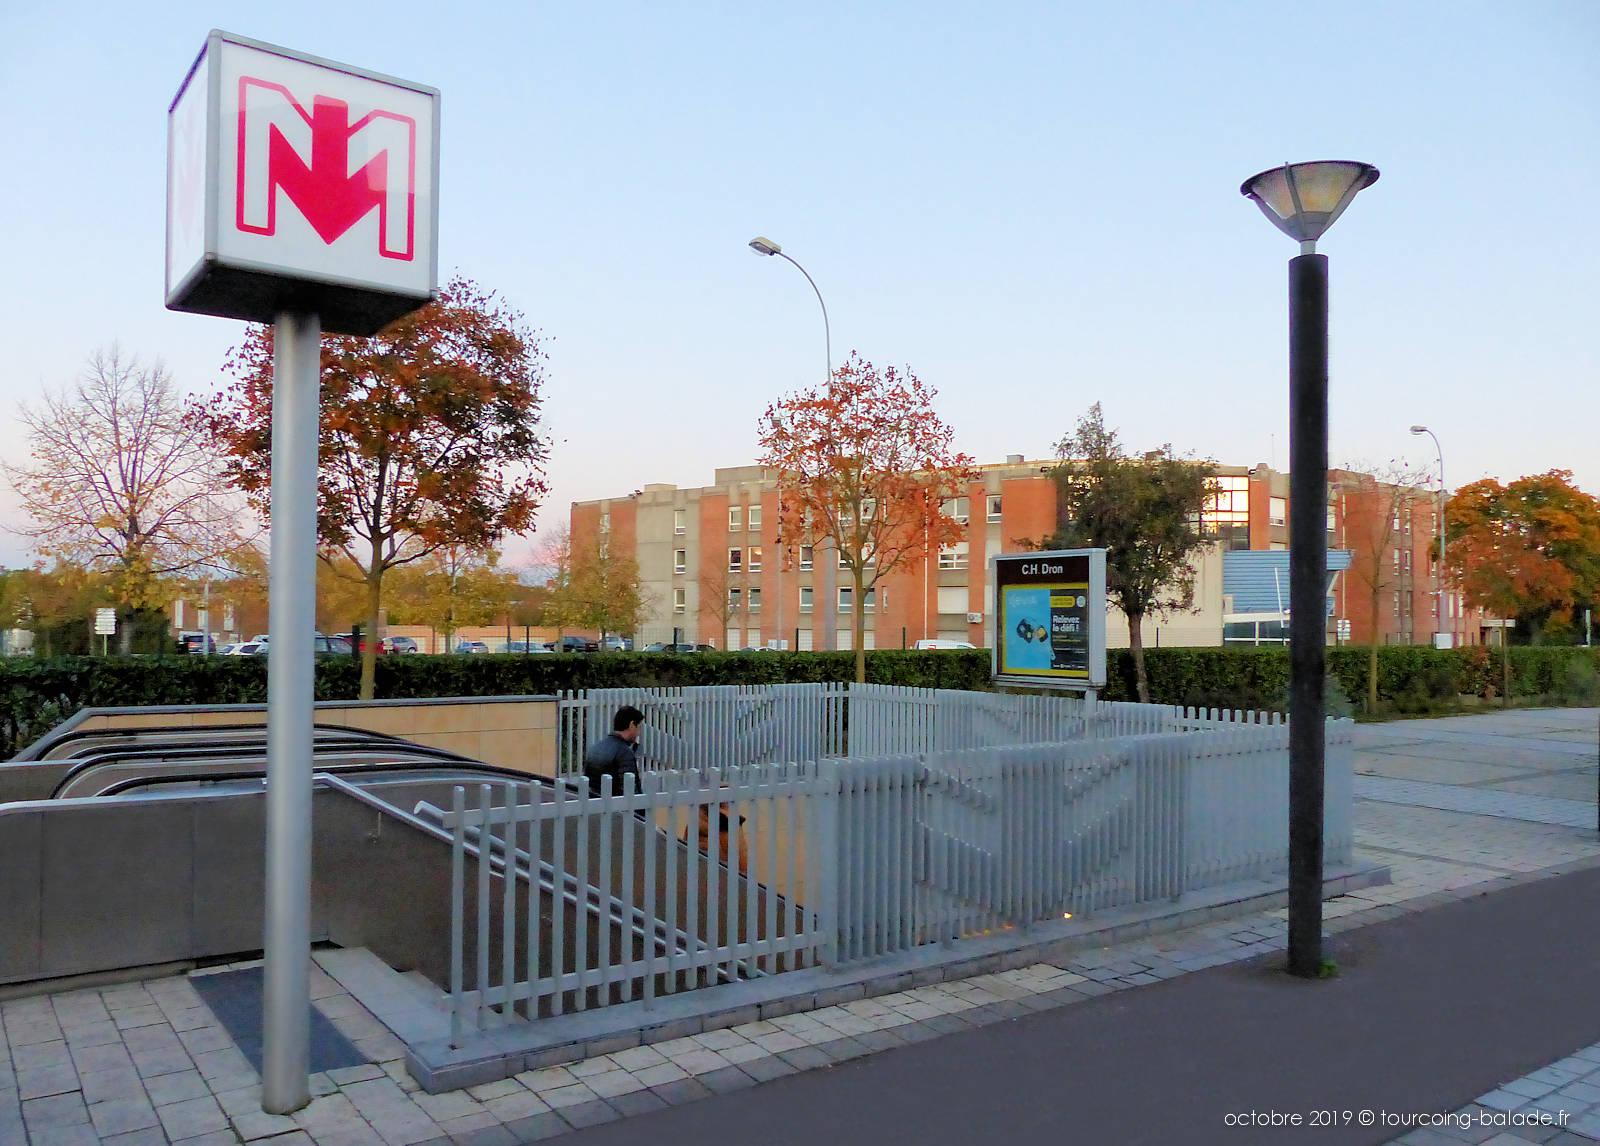 Métro Tourcoing - Station CH Dron Hôpital.